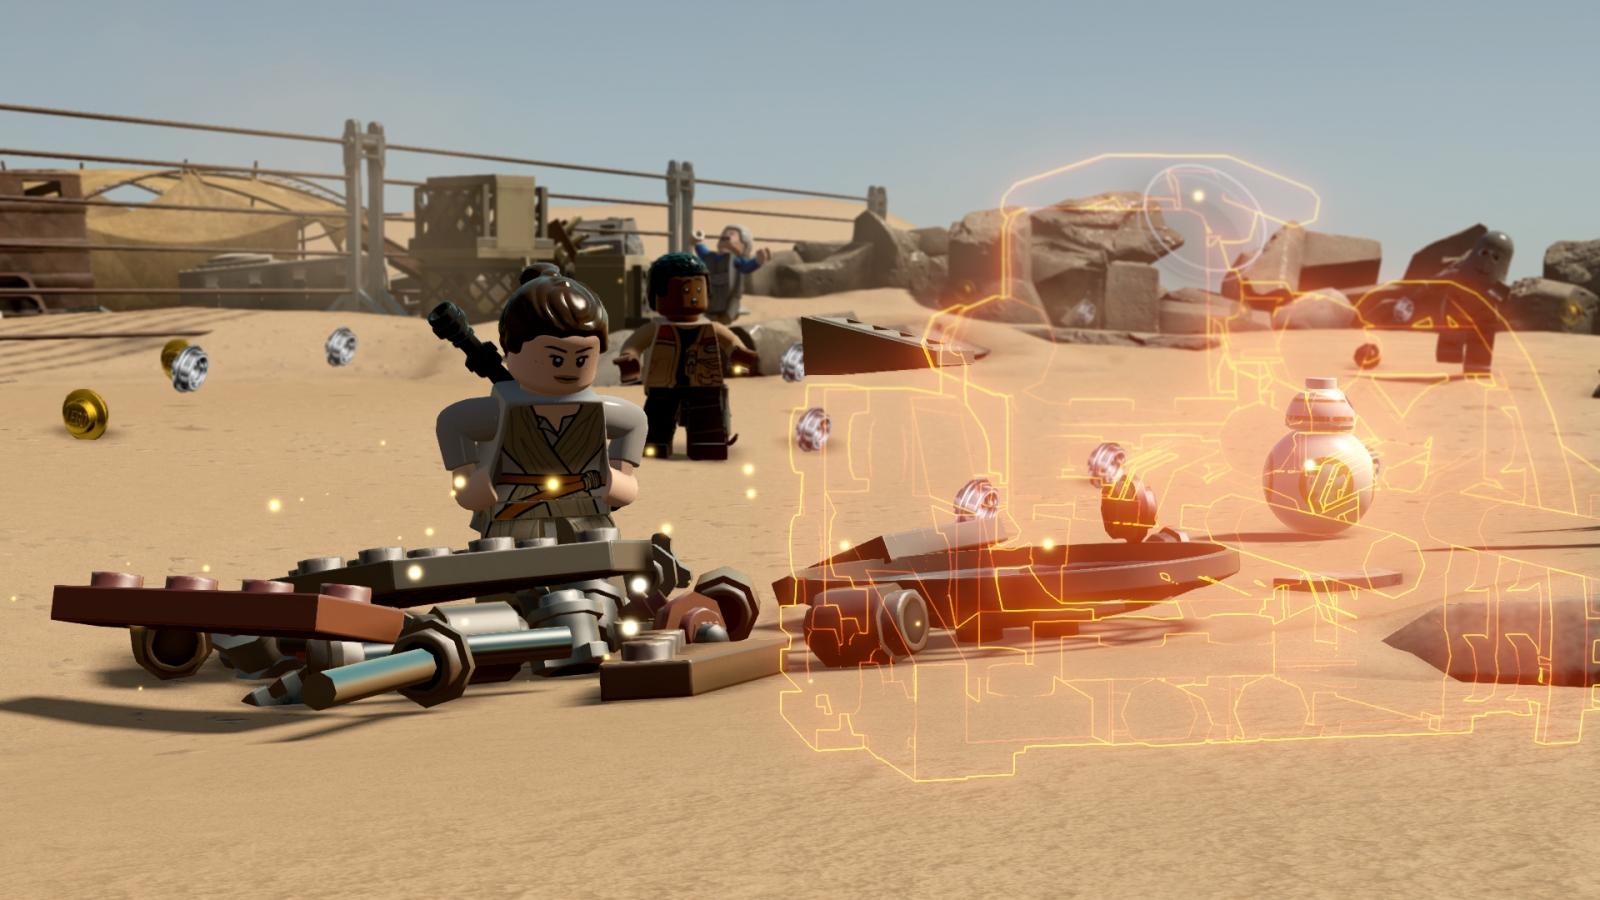 Lego Star Wars Force Awakens multi builds